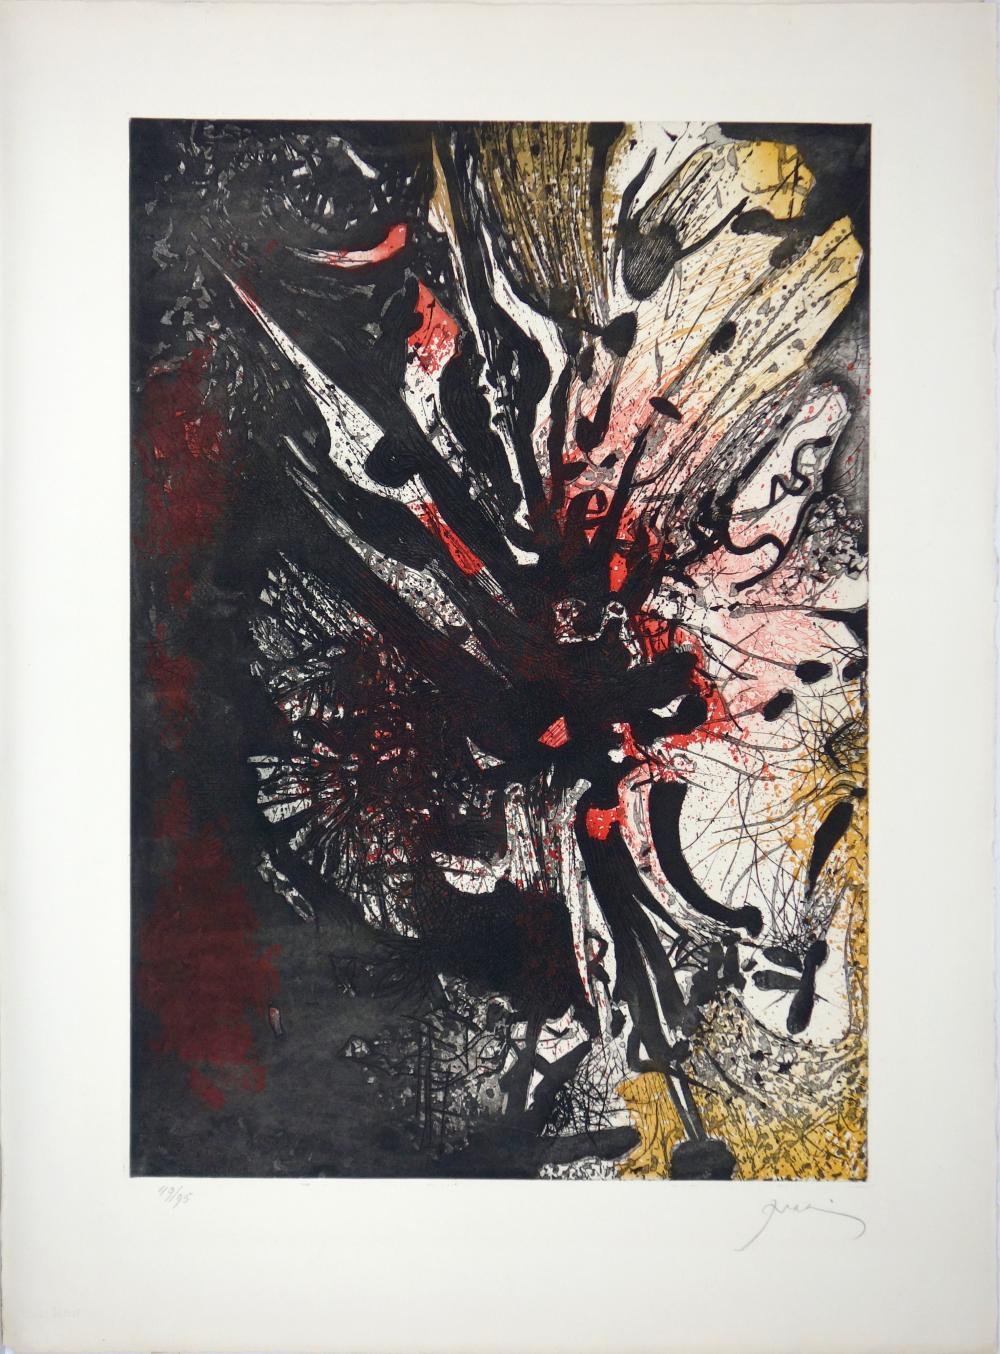 Mario Prassinos (1916–1985): Ohne Titel (1962)